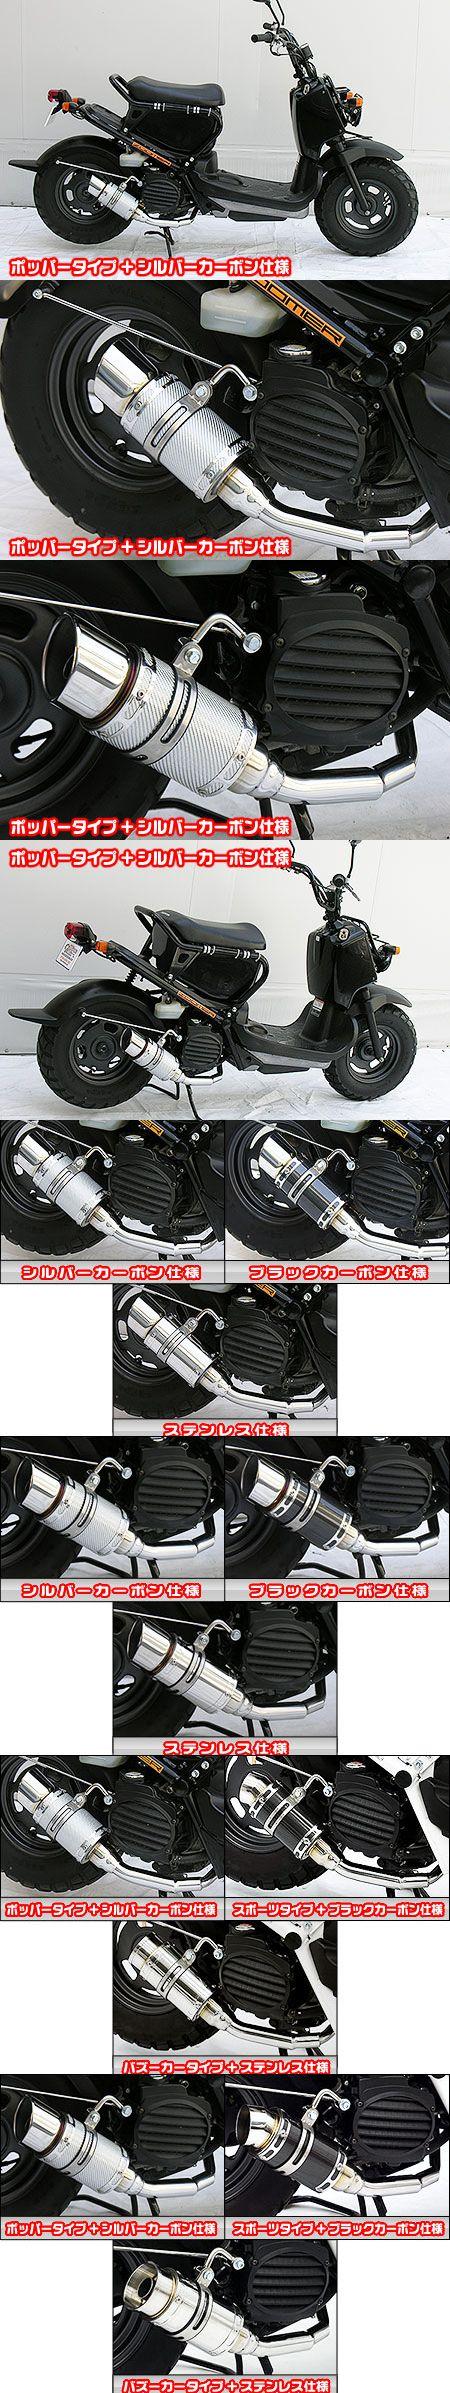 Tiger auto聯名款 Fat Bomber全段排氣管 火箭筒型 銀色碳纖維款式